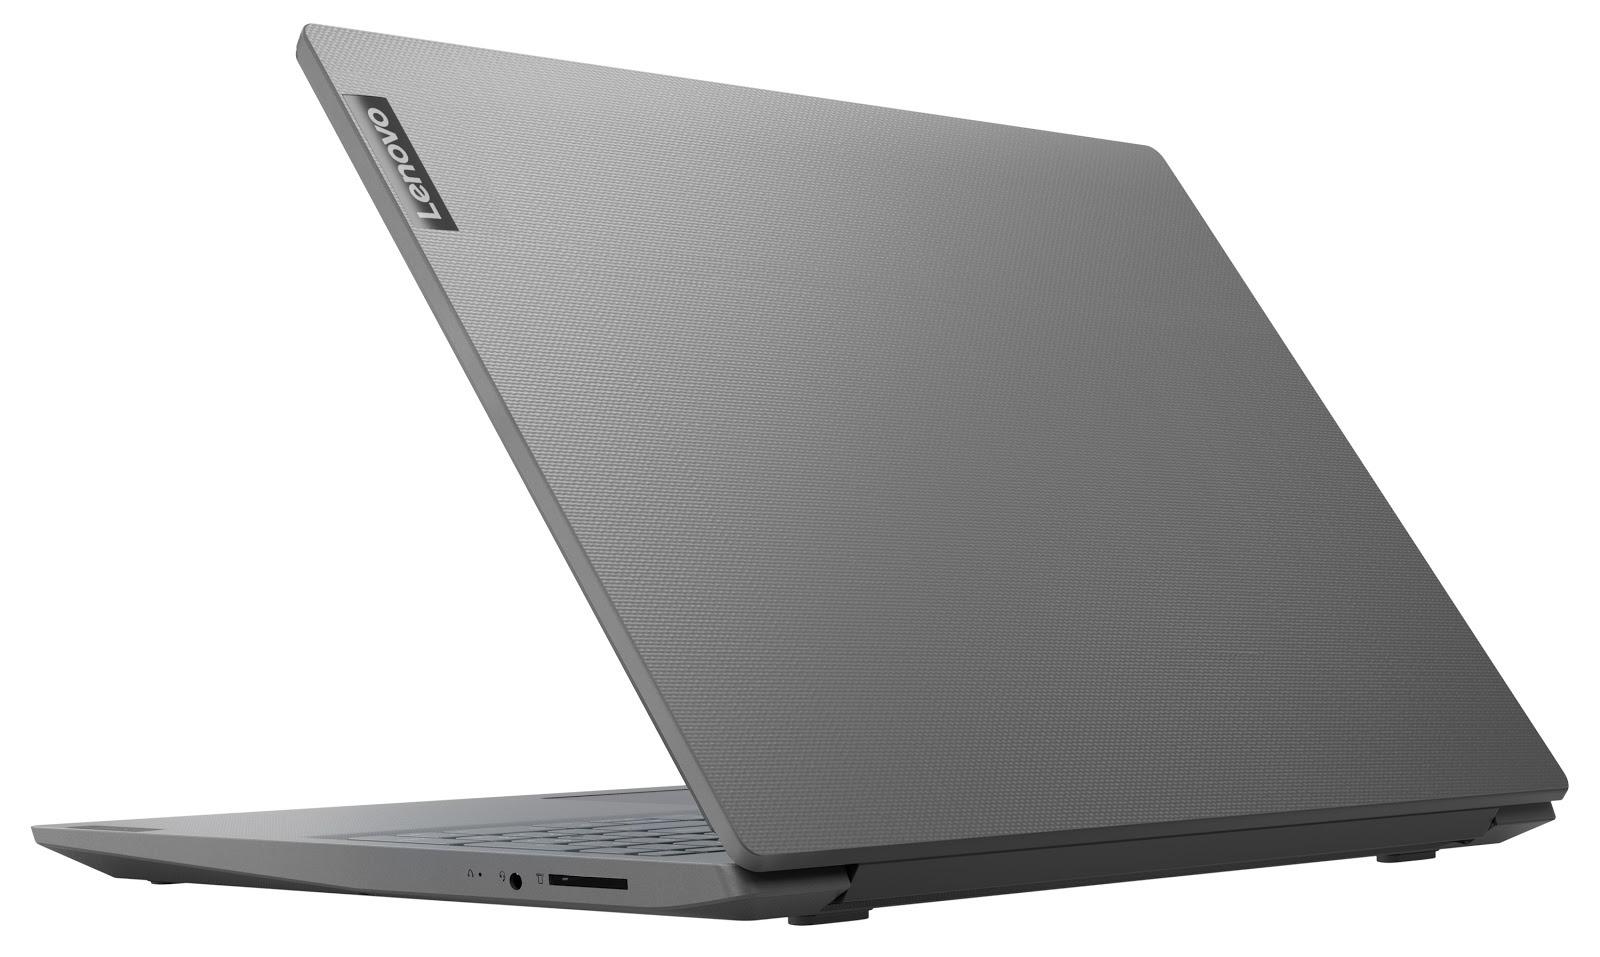 Фото 1. Ноутбук Lenovo V15 ADA Iron Grey (82C7009URU)